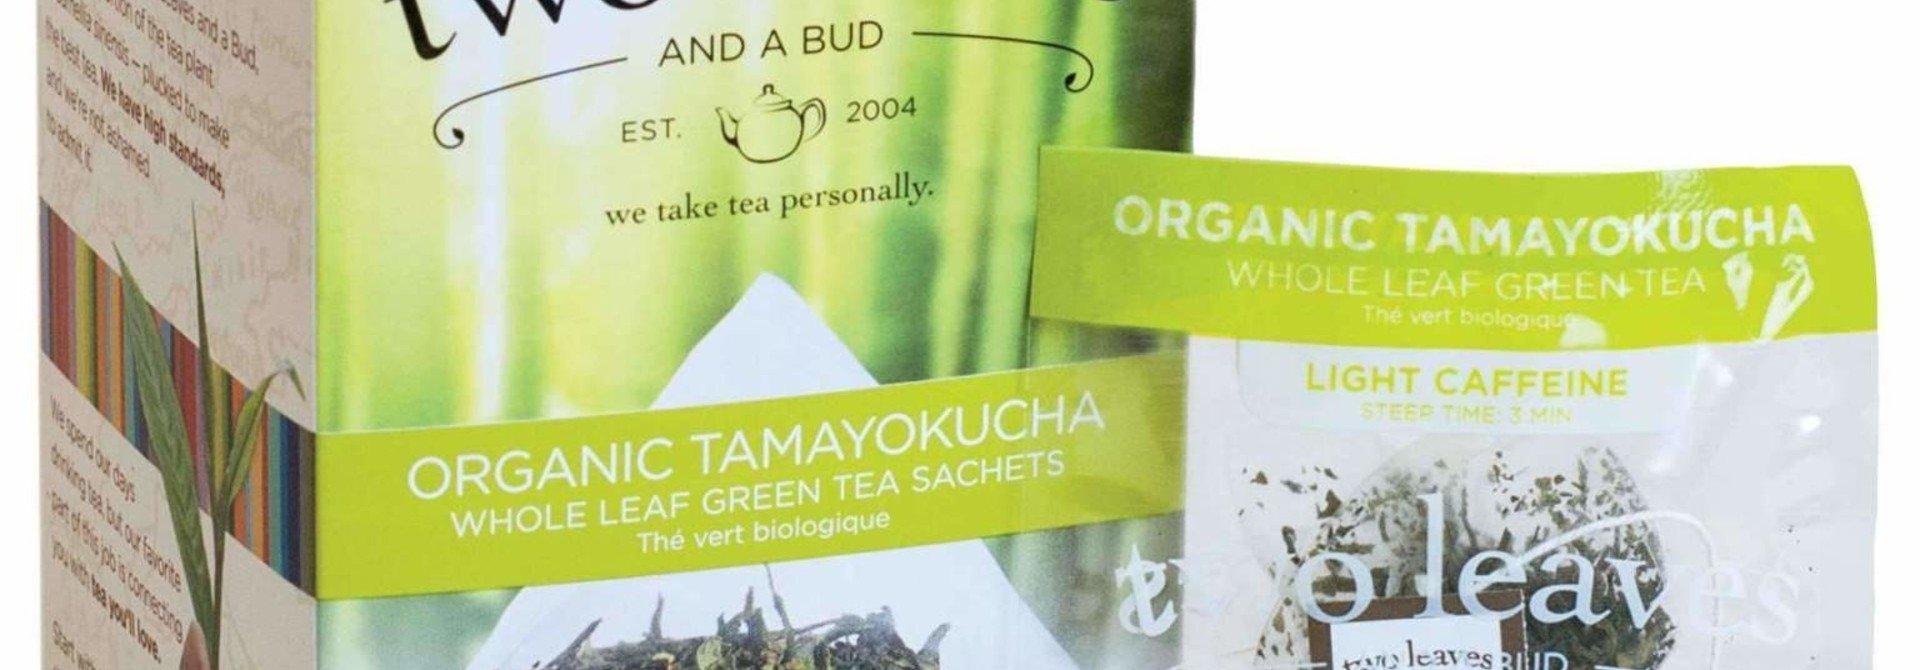 Two Leaves and a bud-Organic Tamayokucha Whole leaf green tea sachets